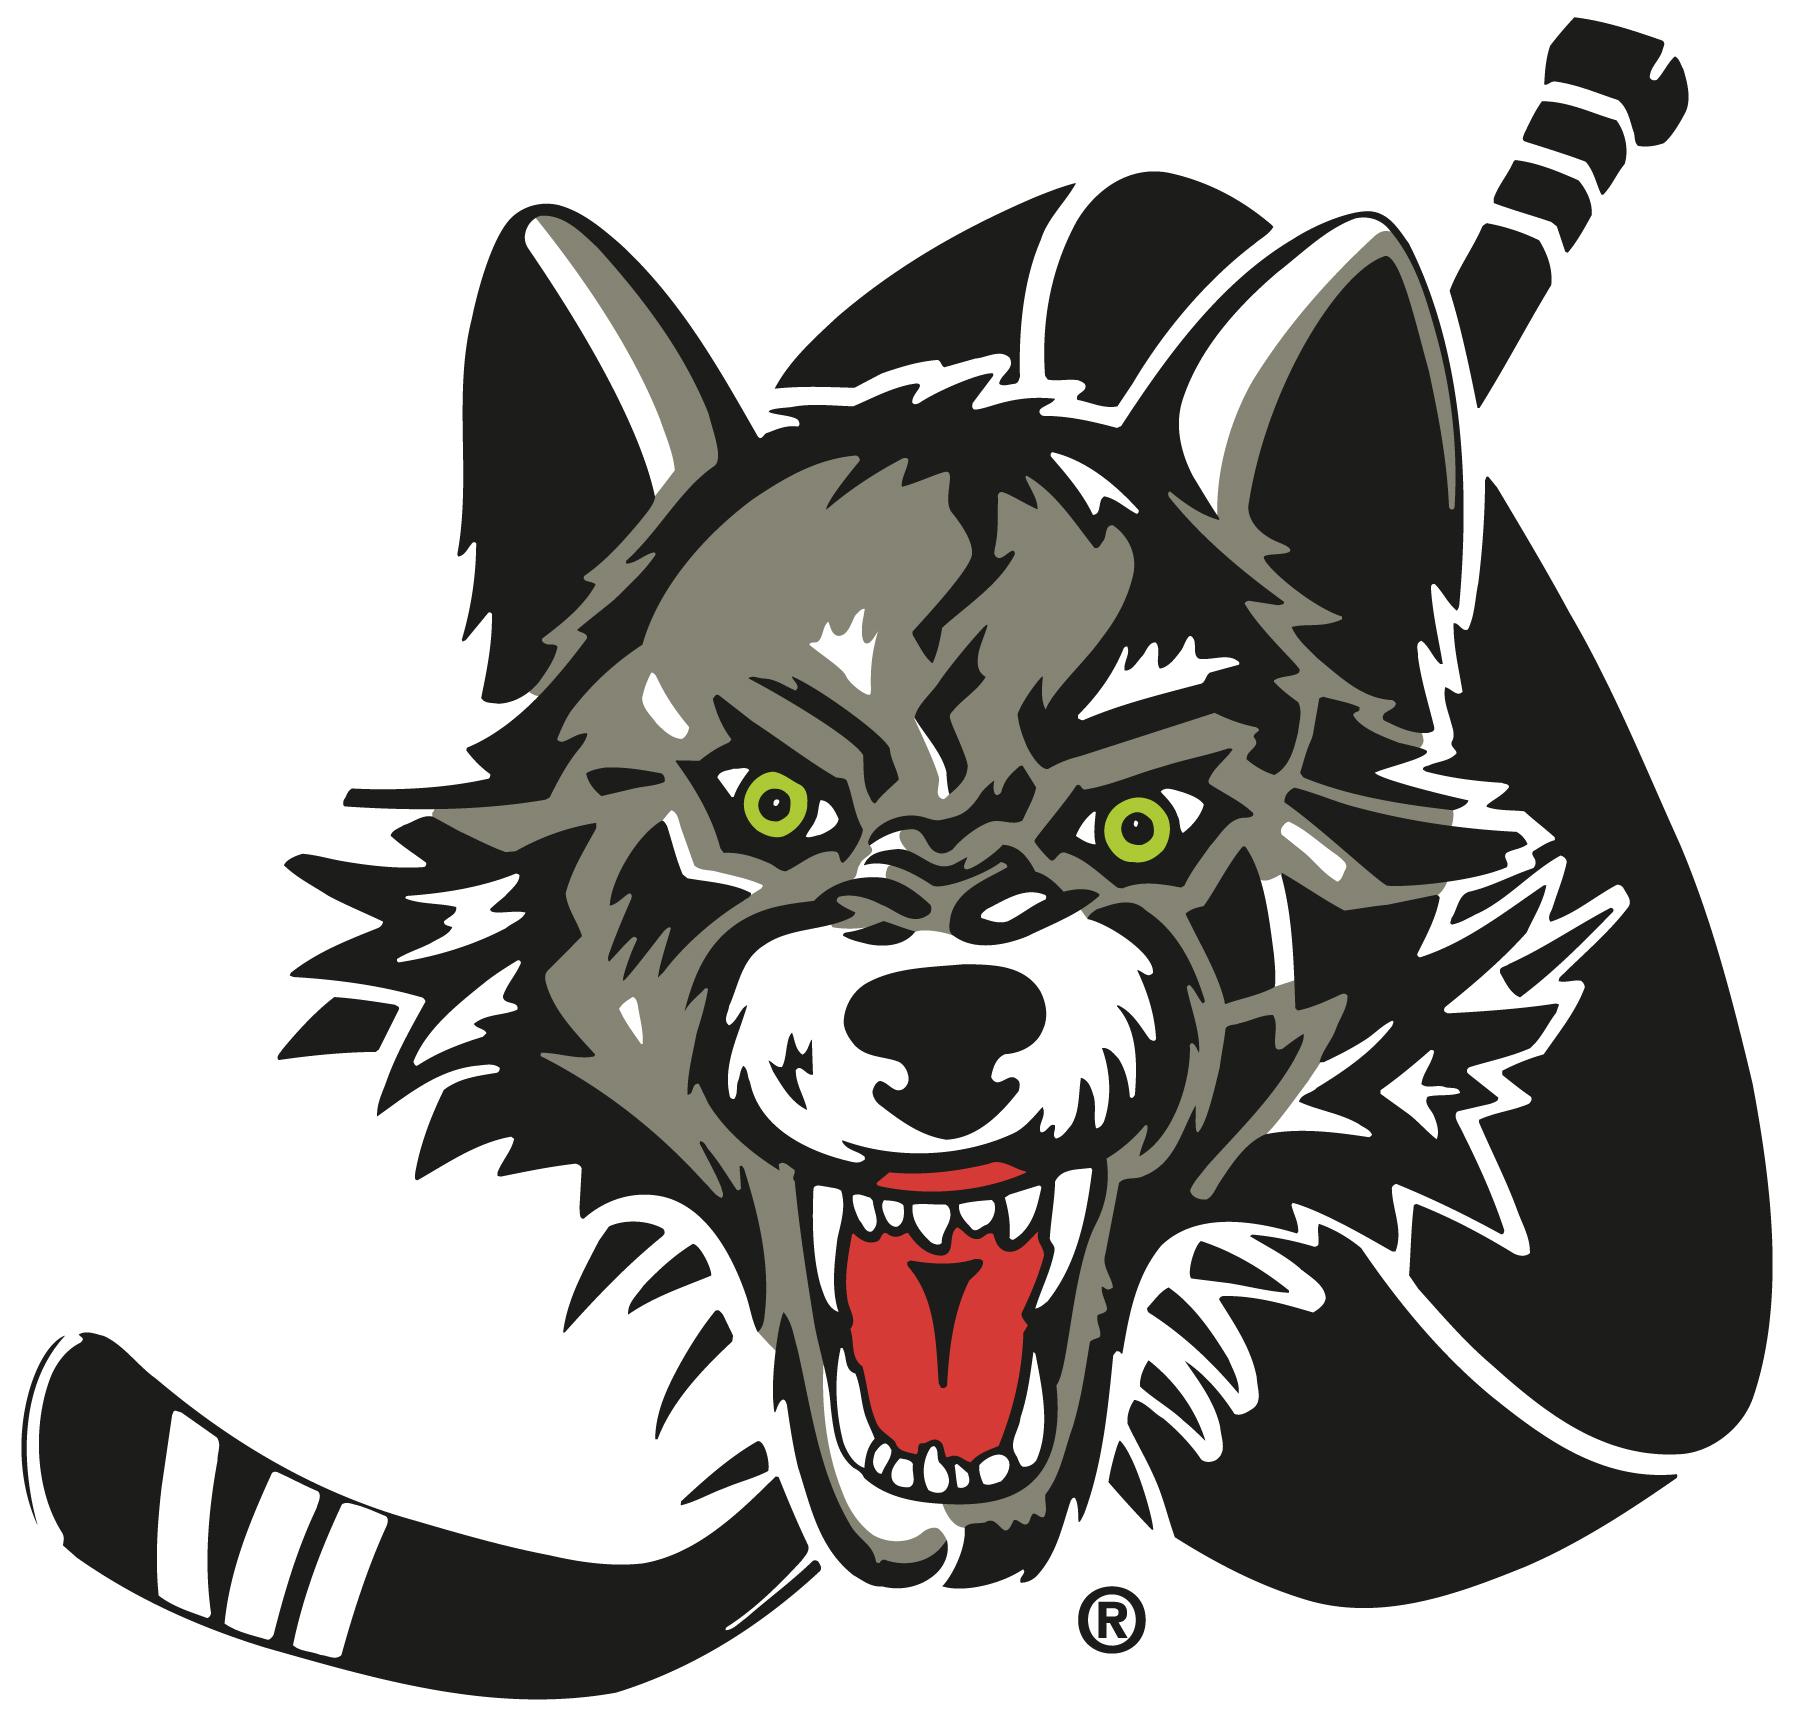 Wolves_Main_08